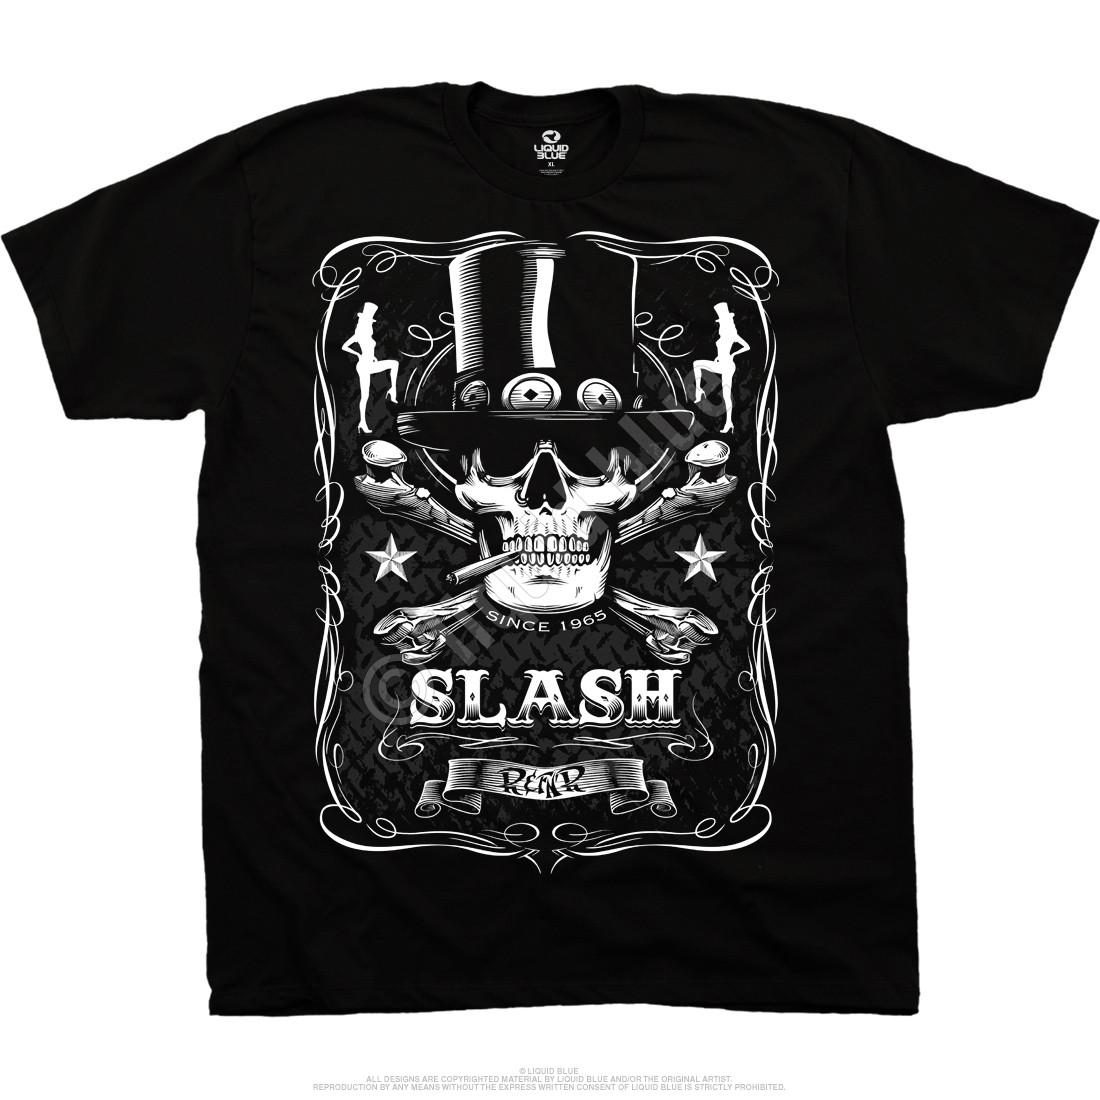 Bottle Of Slash Black Athletic T-Shirt